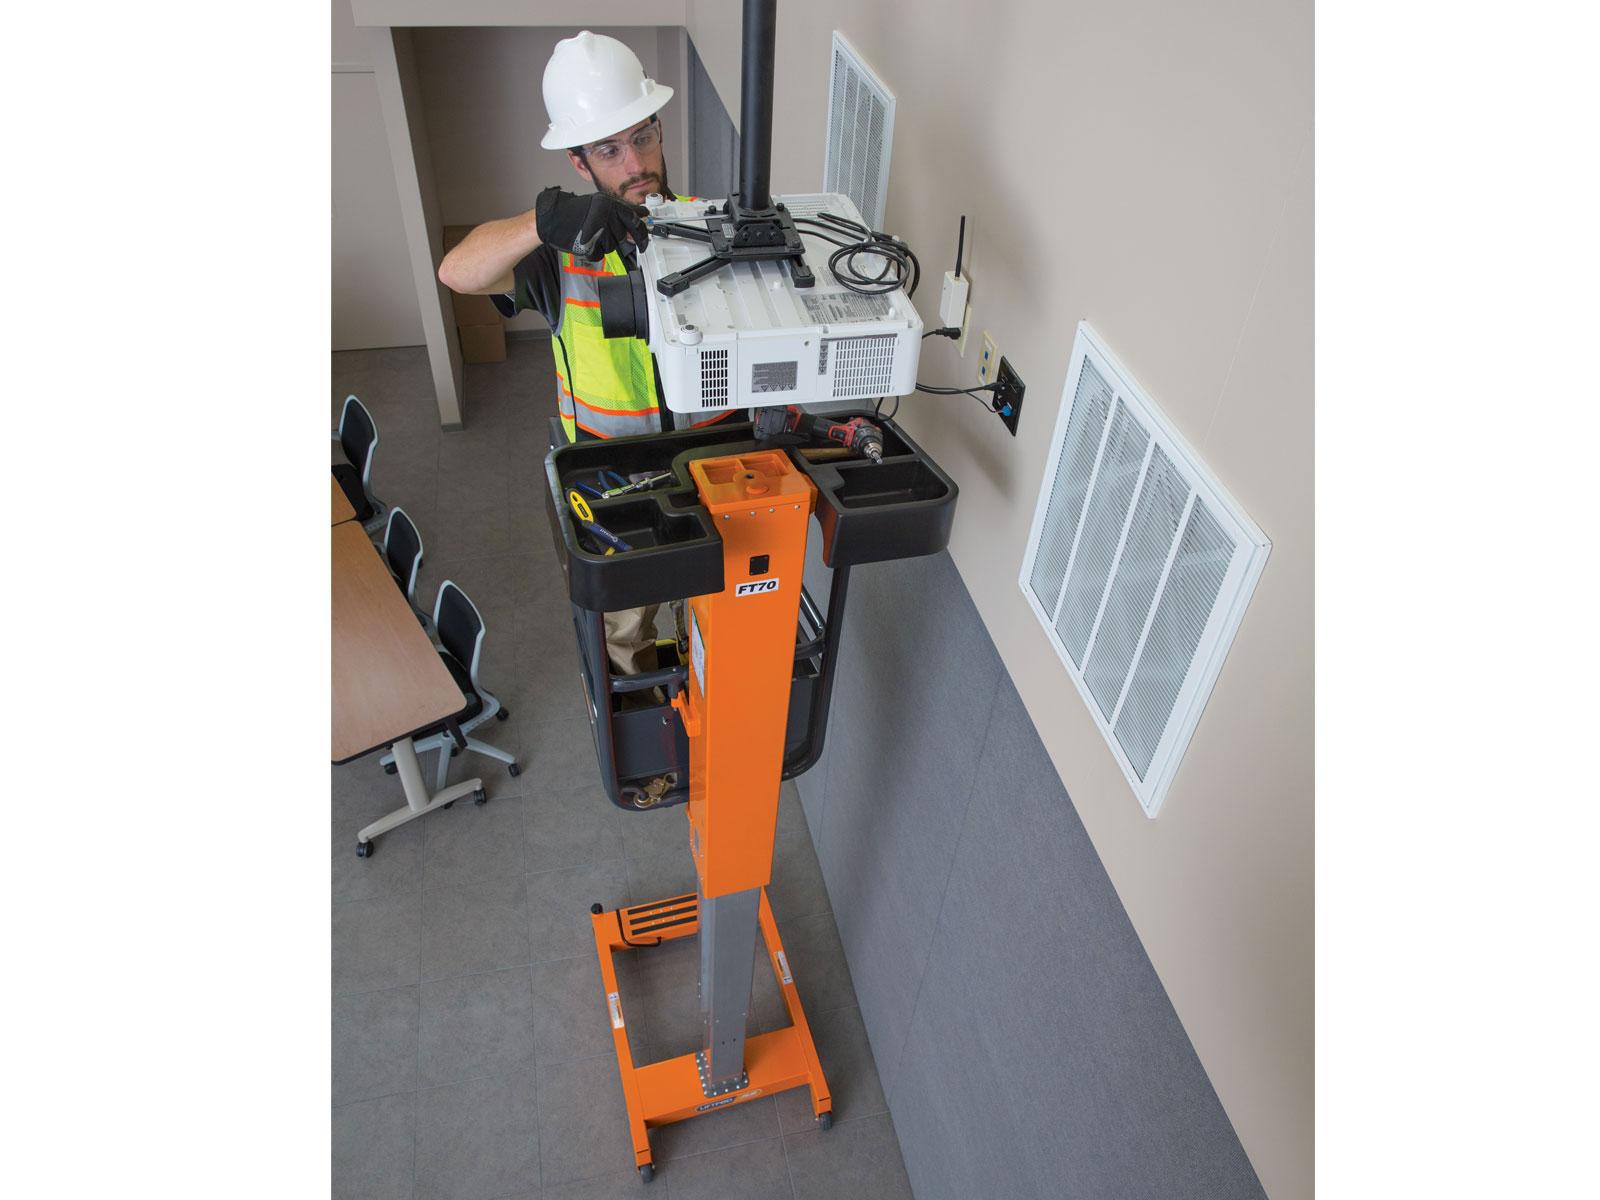 Personal Portable Lift 14 ft Liftpod  Decker Tool